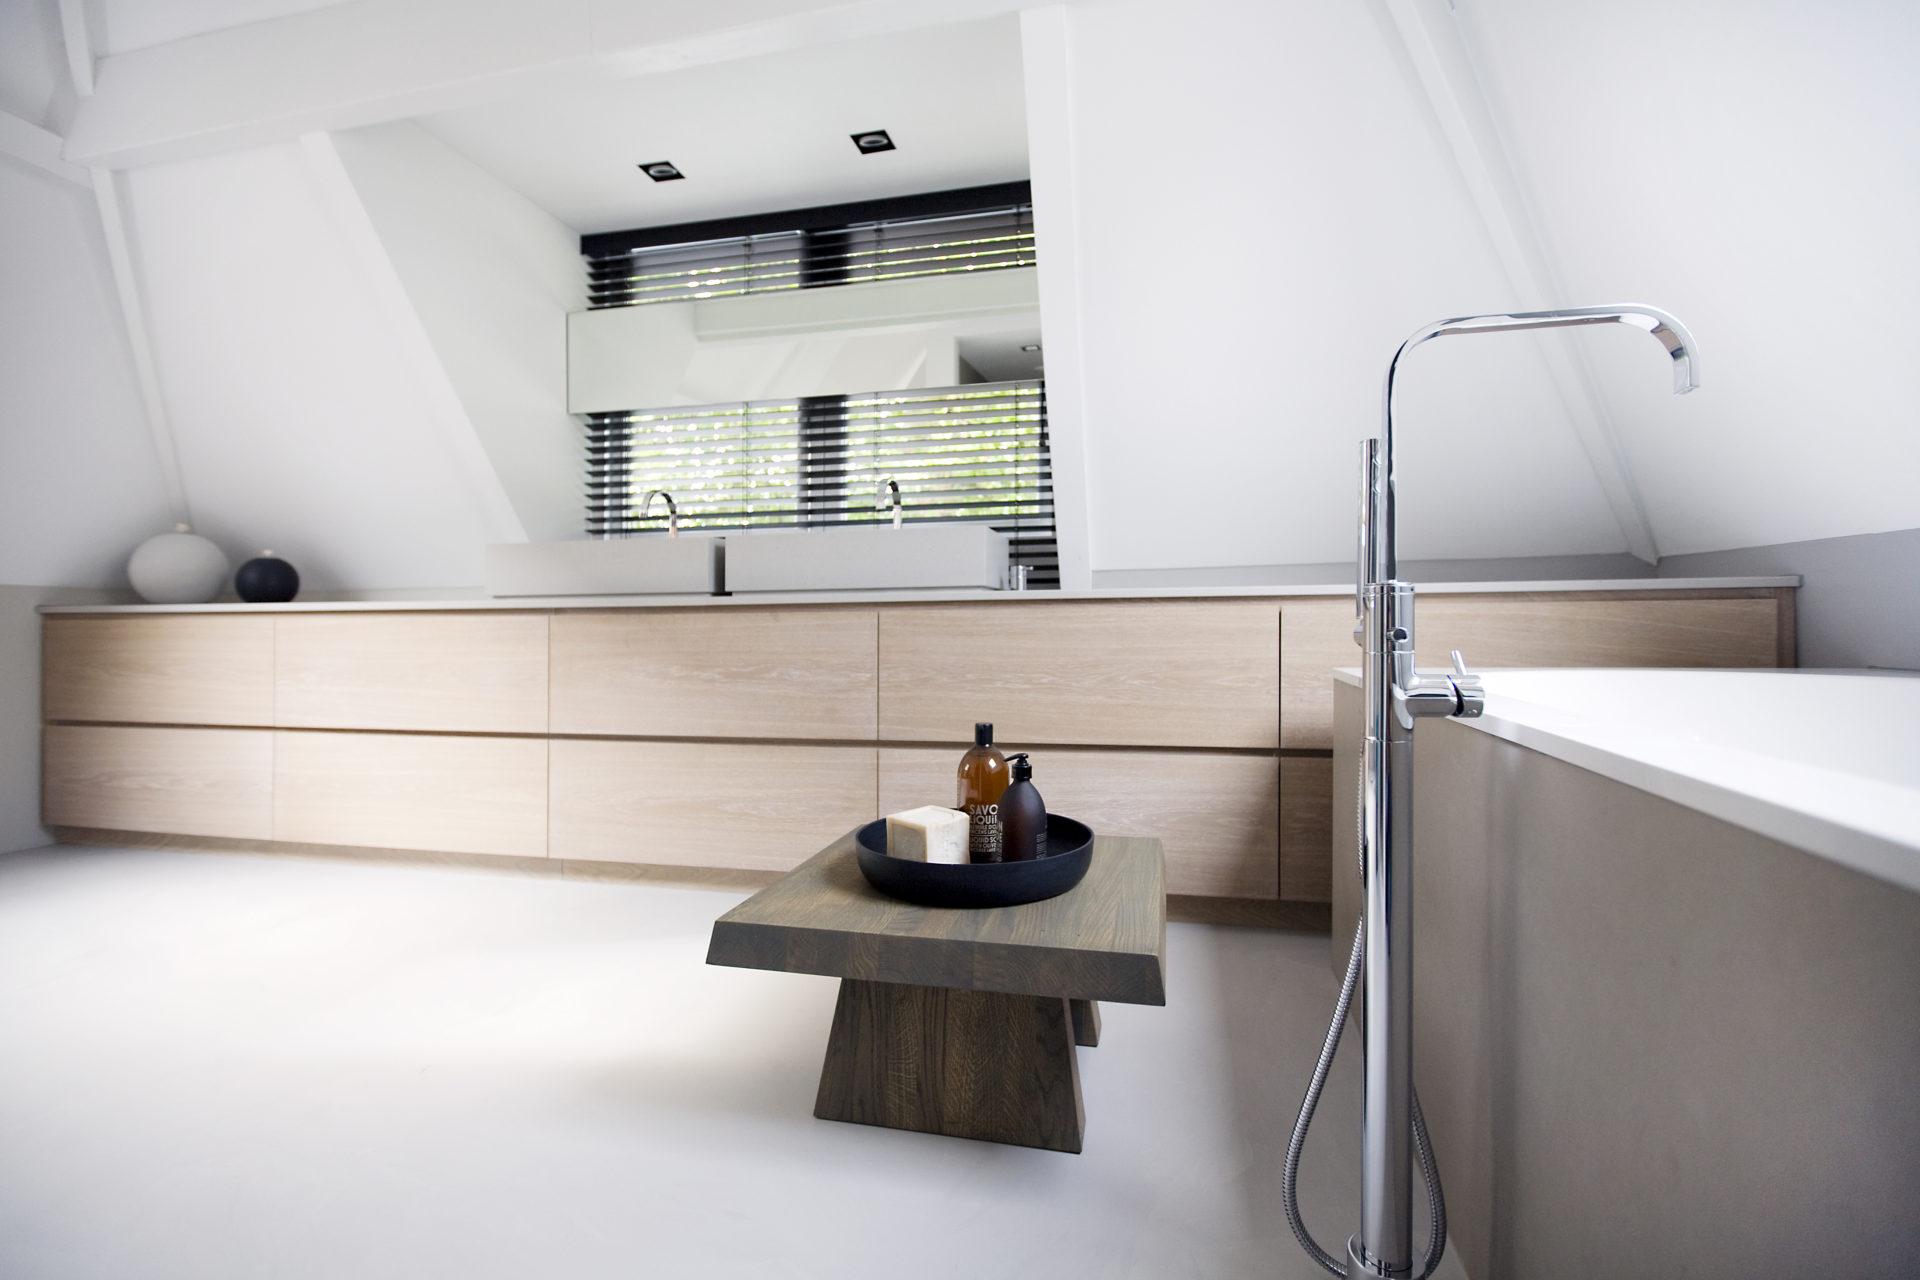 capaz-mirandakoopman-interieur-fotografie-remymeijers-9461